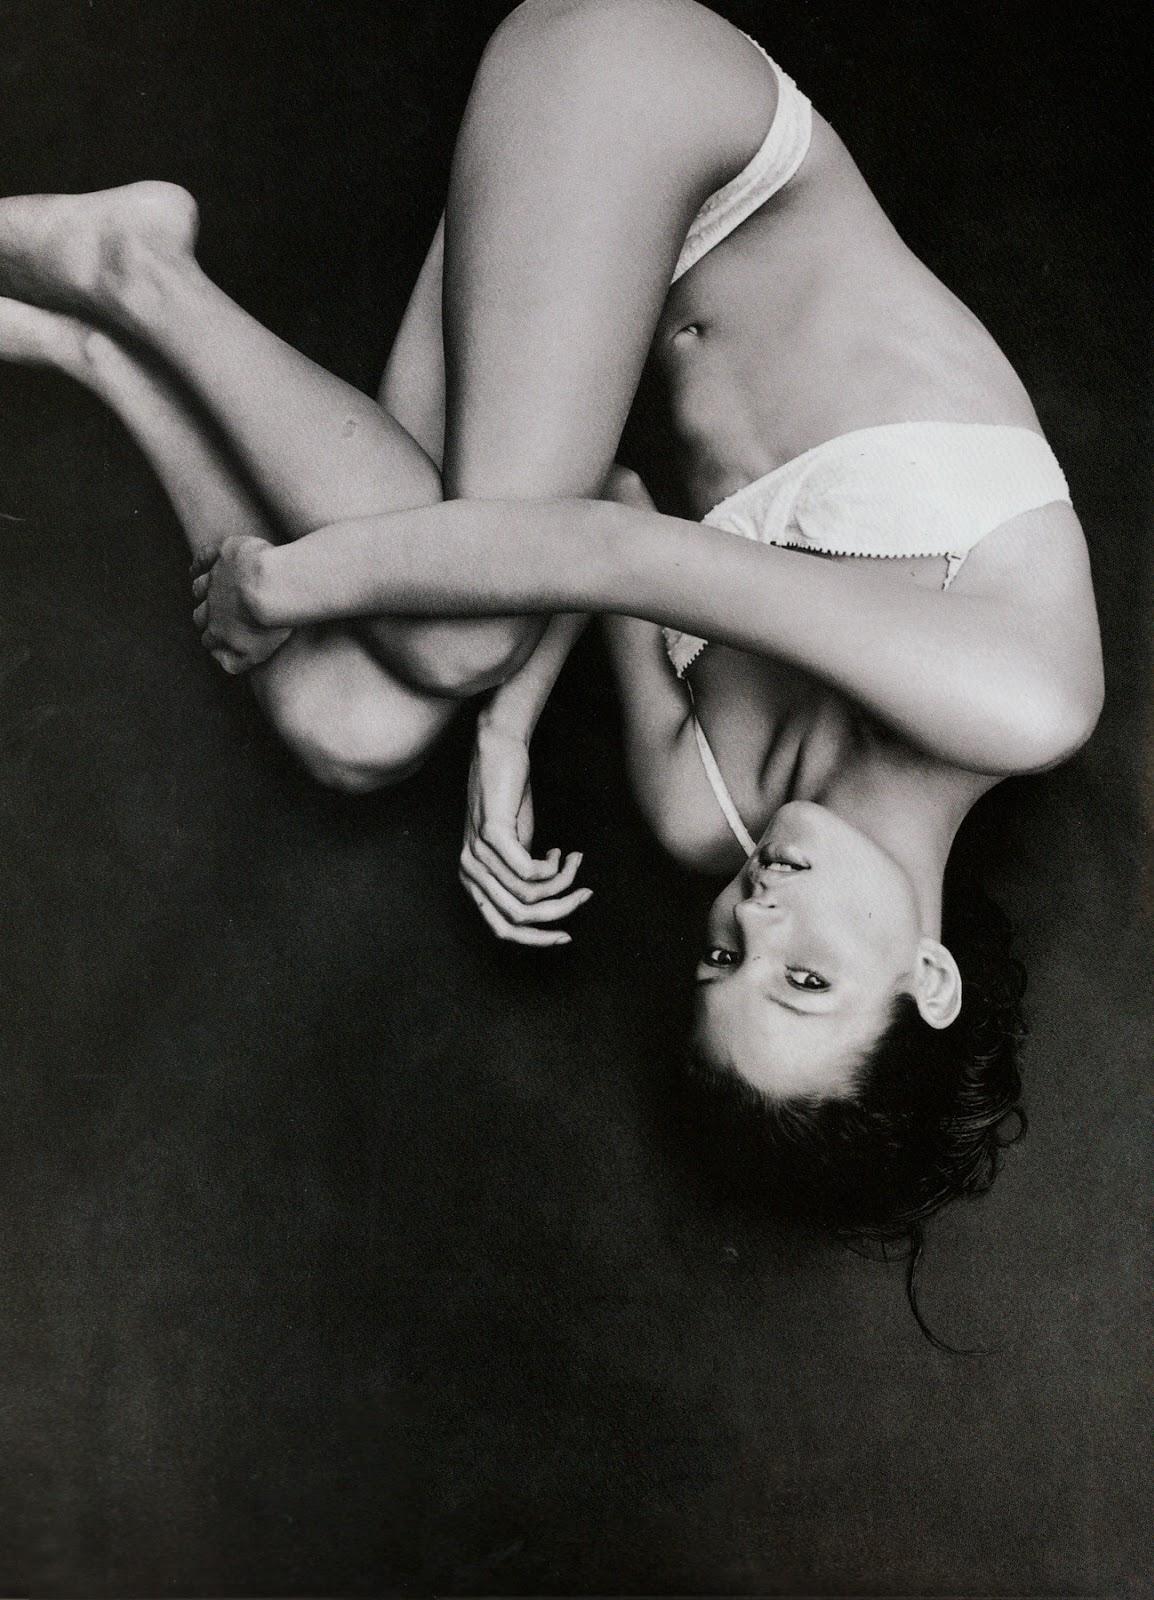 Kate Moss in Body of evidence | Harper's Bazaar US July 1993 (photography: Patrick Demarchelier)